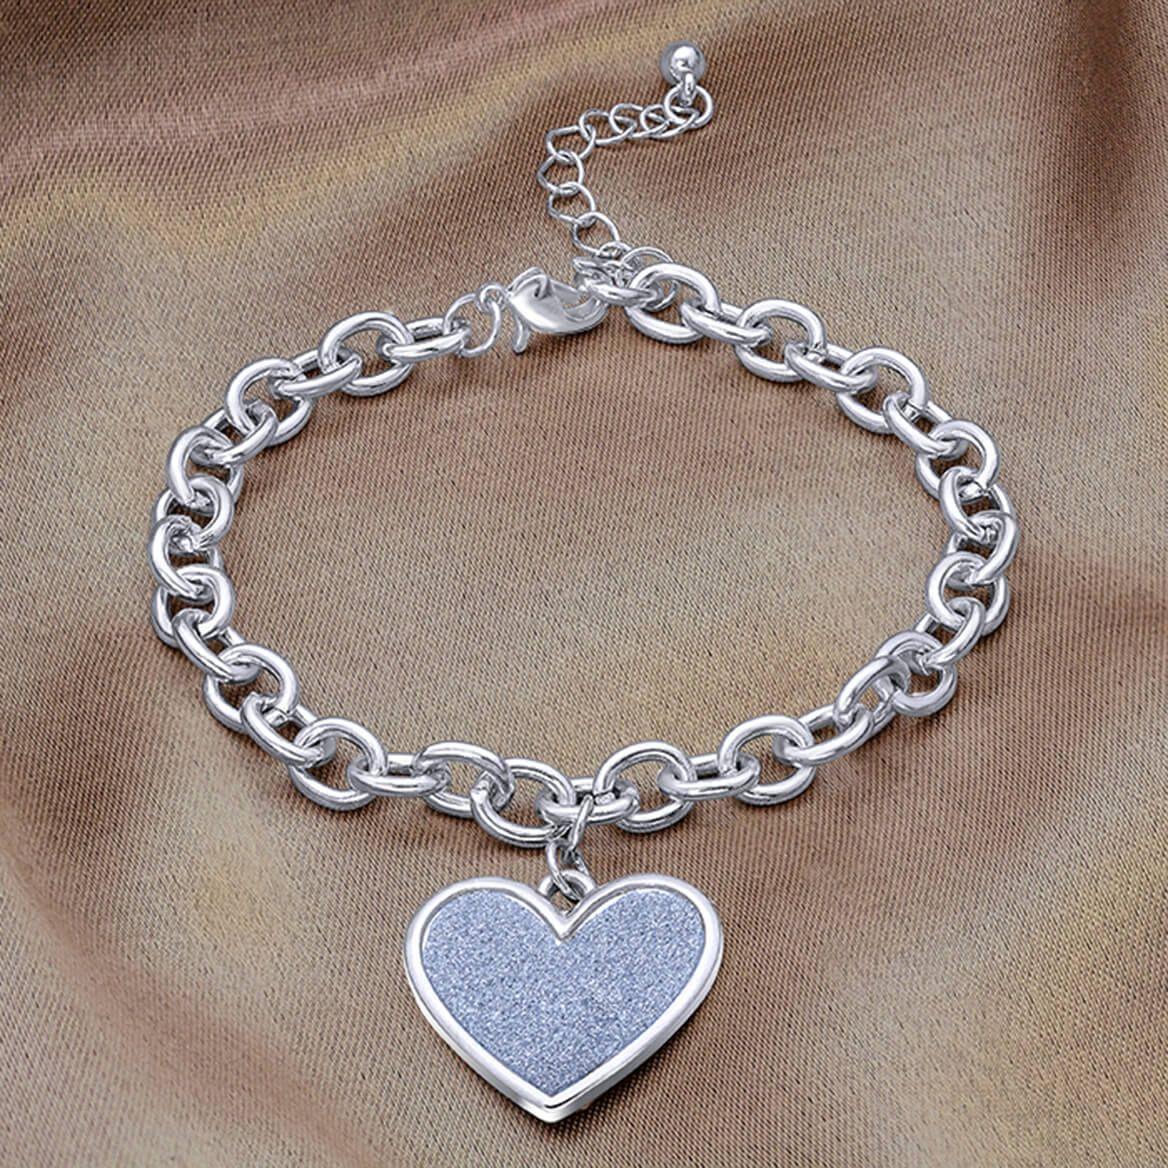 Diamond Dust Heart Charm Bracelet-366313